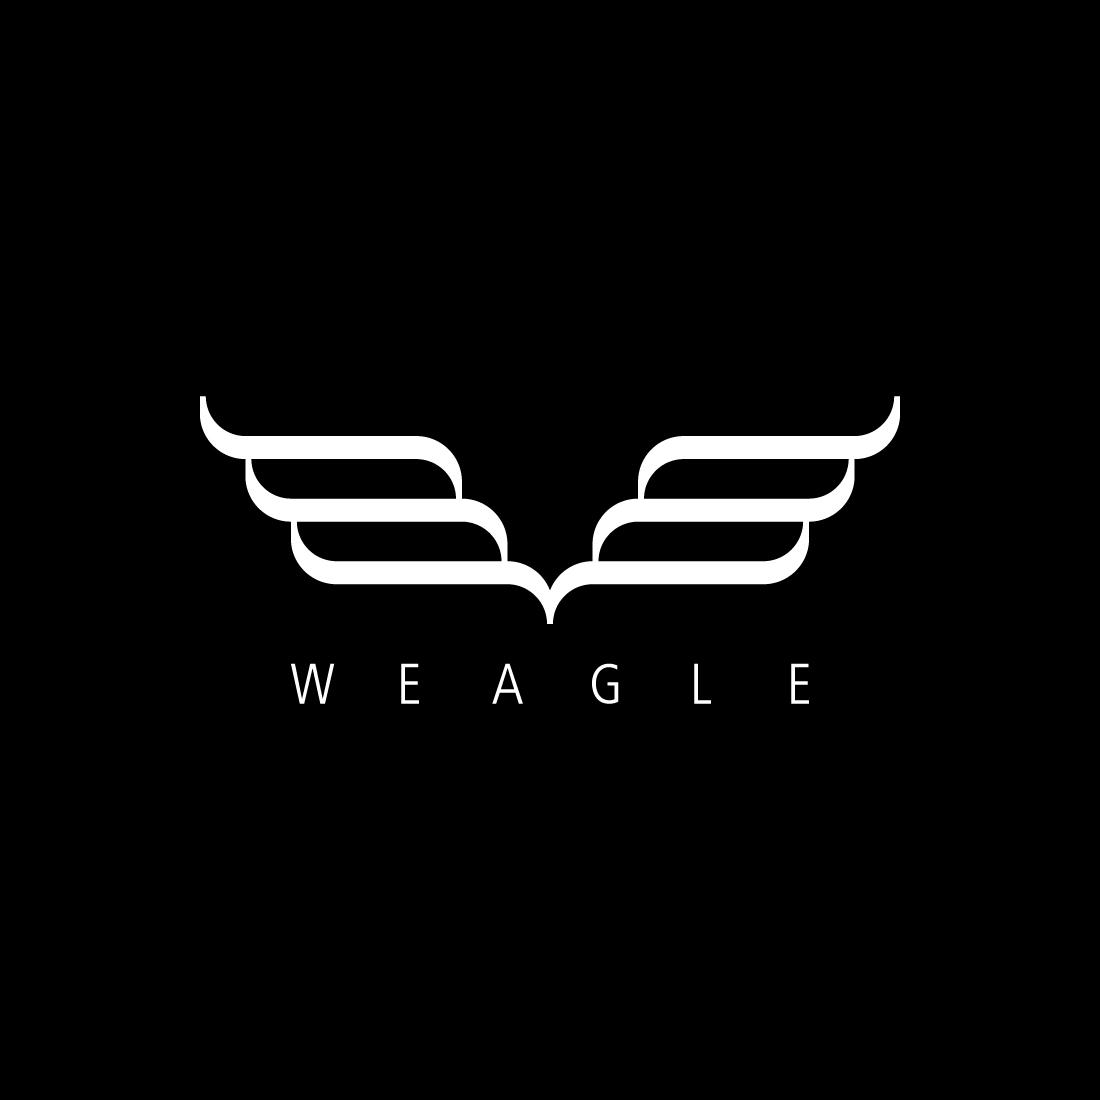 WEAGLE